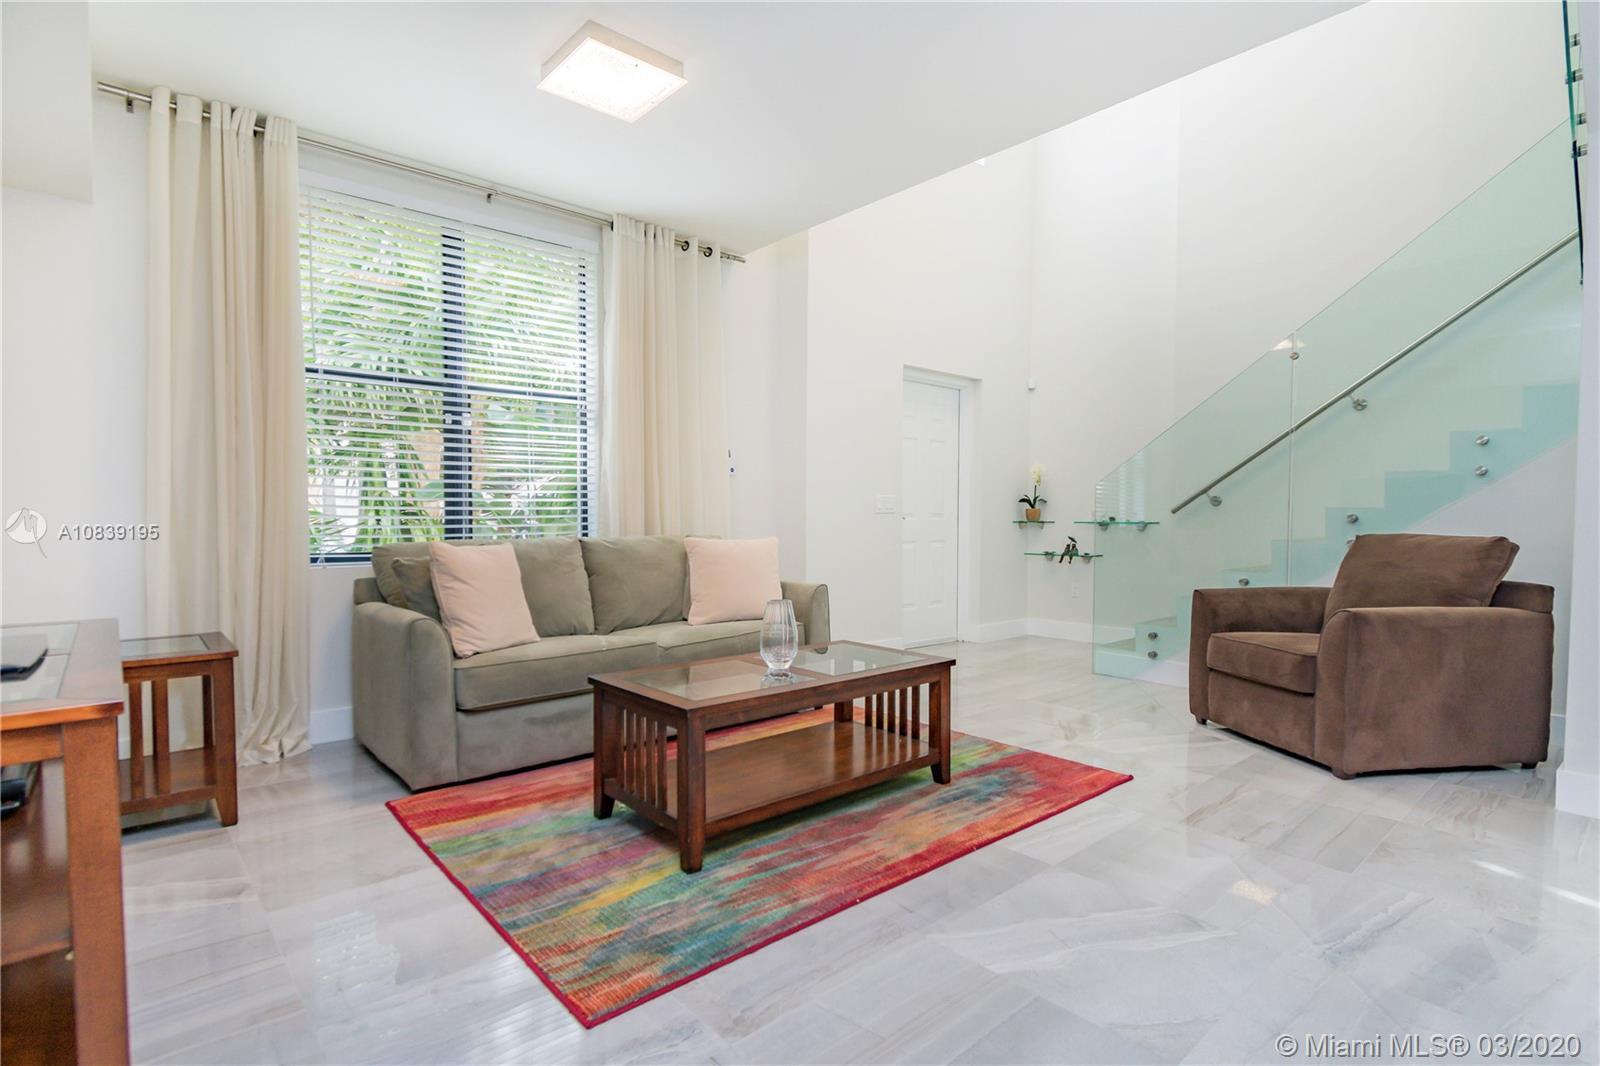 888 S Douglas Rd # 105, Coral Gables, Florida 33134, 1 Bedroom Bedrooms, ,2 BathroomsBathrooms,Residential,For Sale,888 S Douglas Rd # 105,A10839195